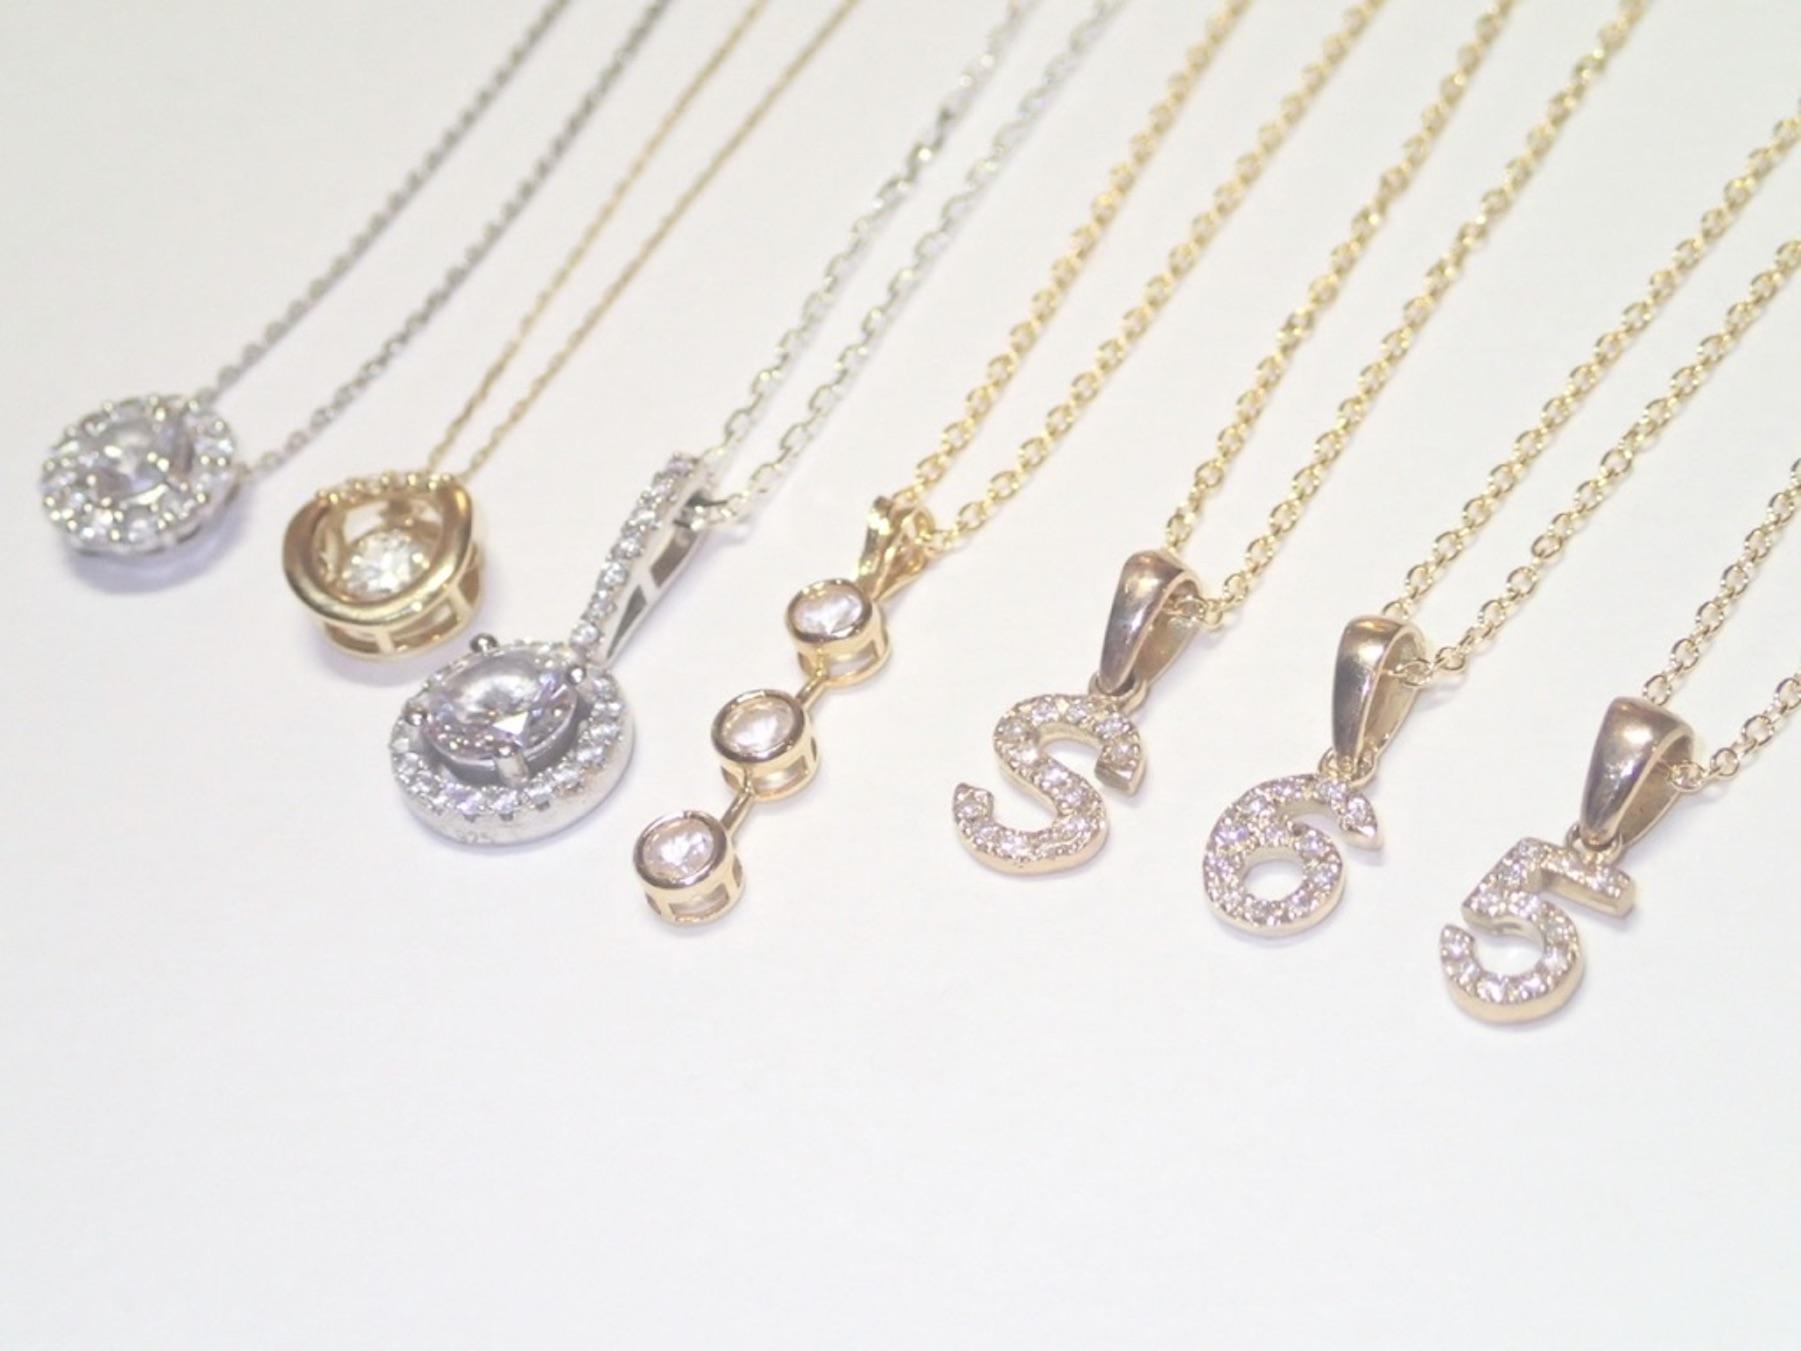 daia,daiamond,ダイヤ,ダイヤモンド,ジュエリー,ネックレス